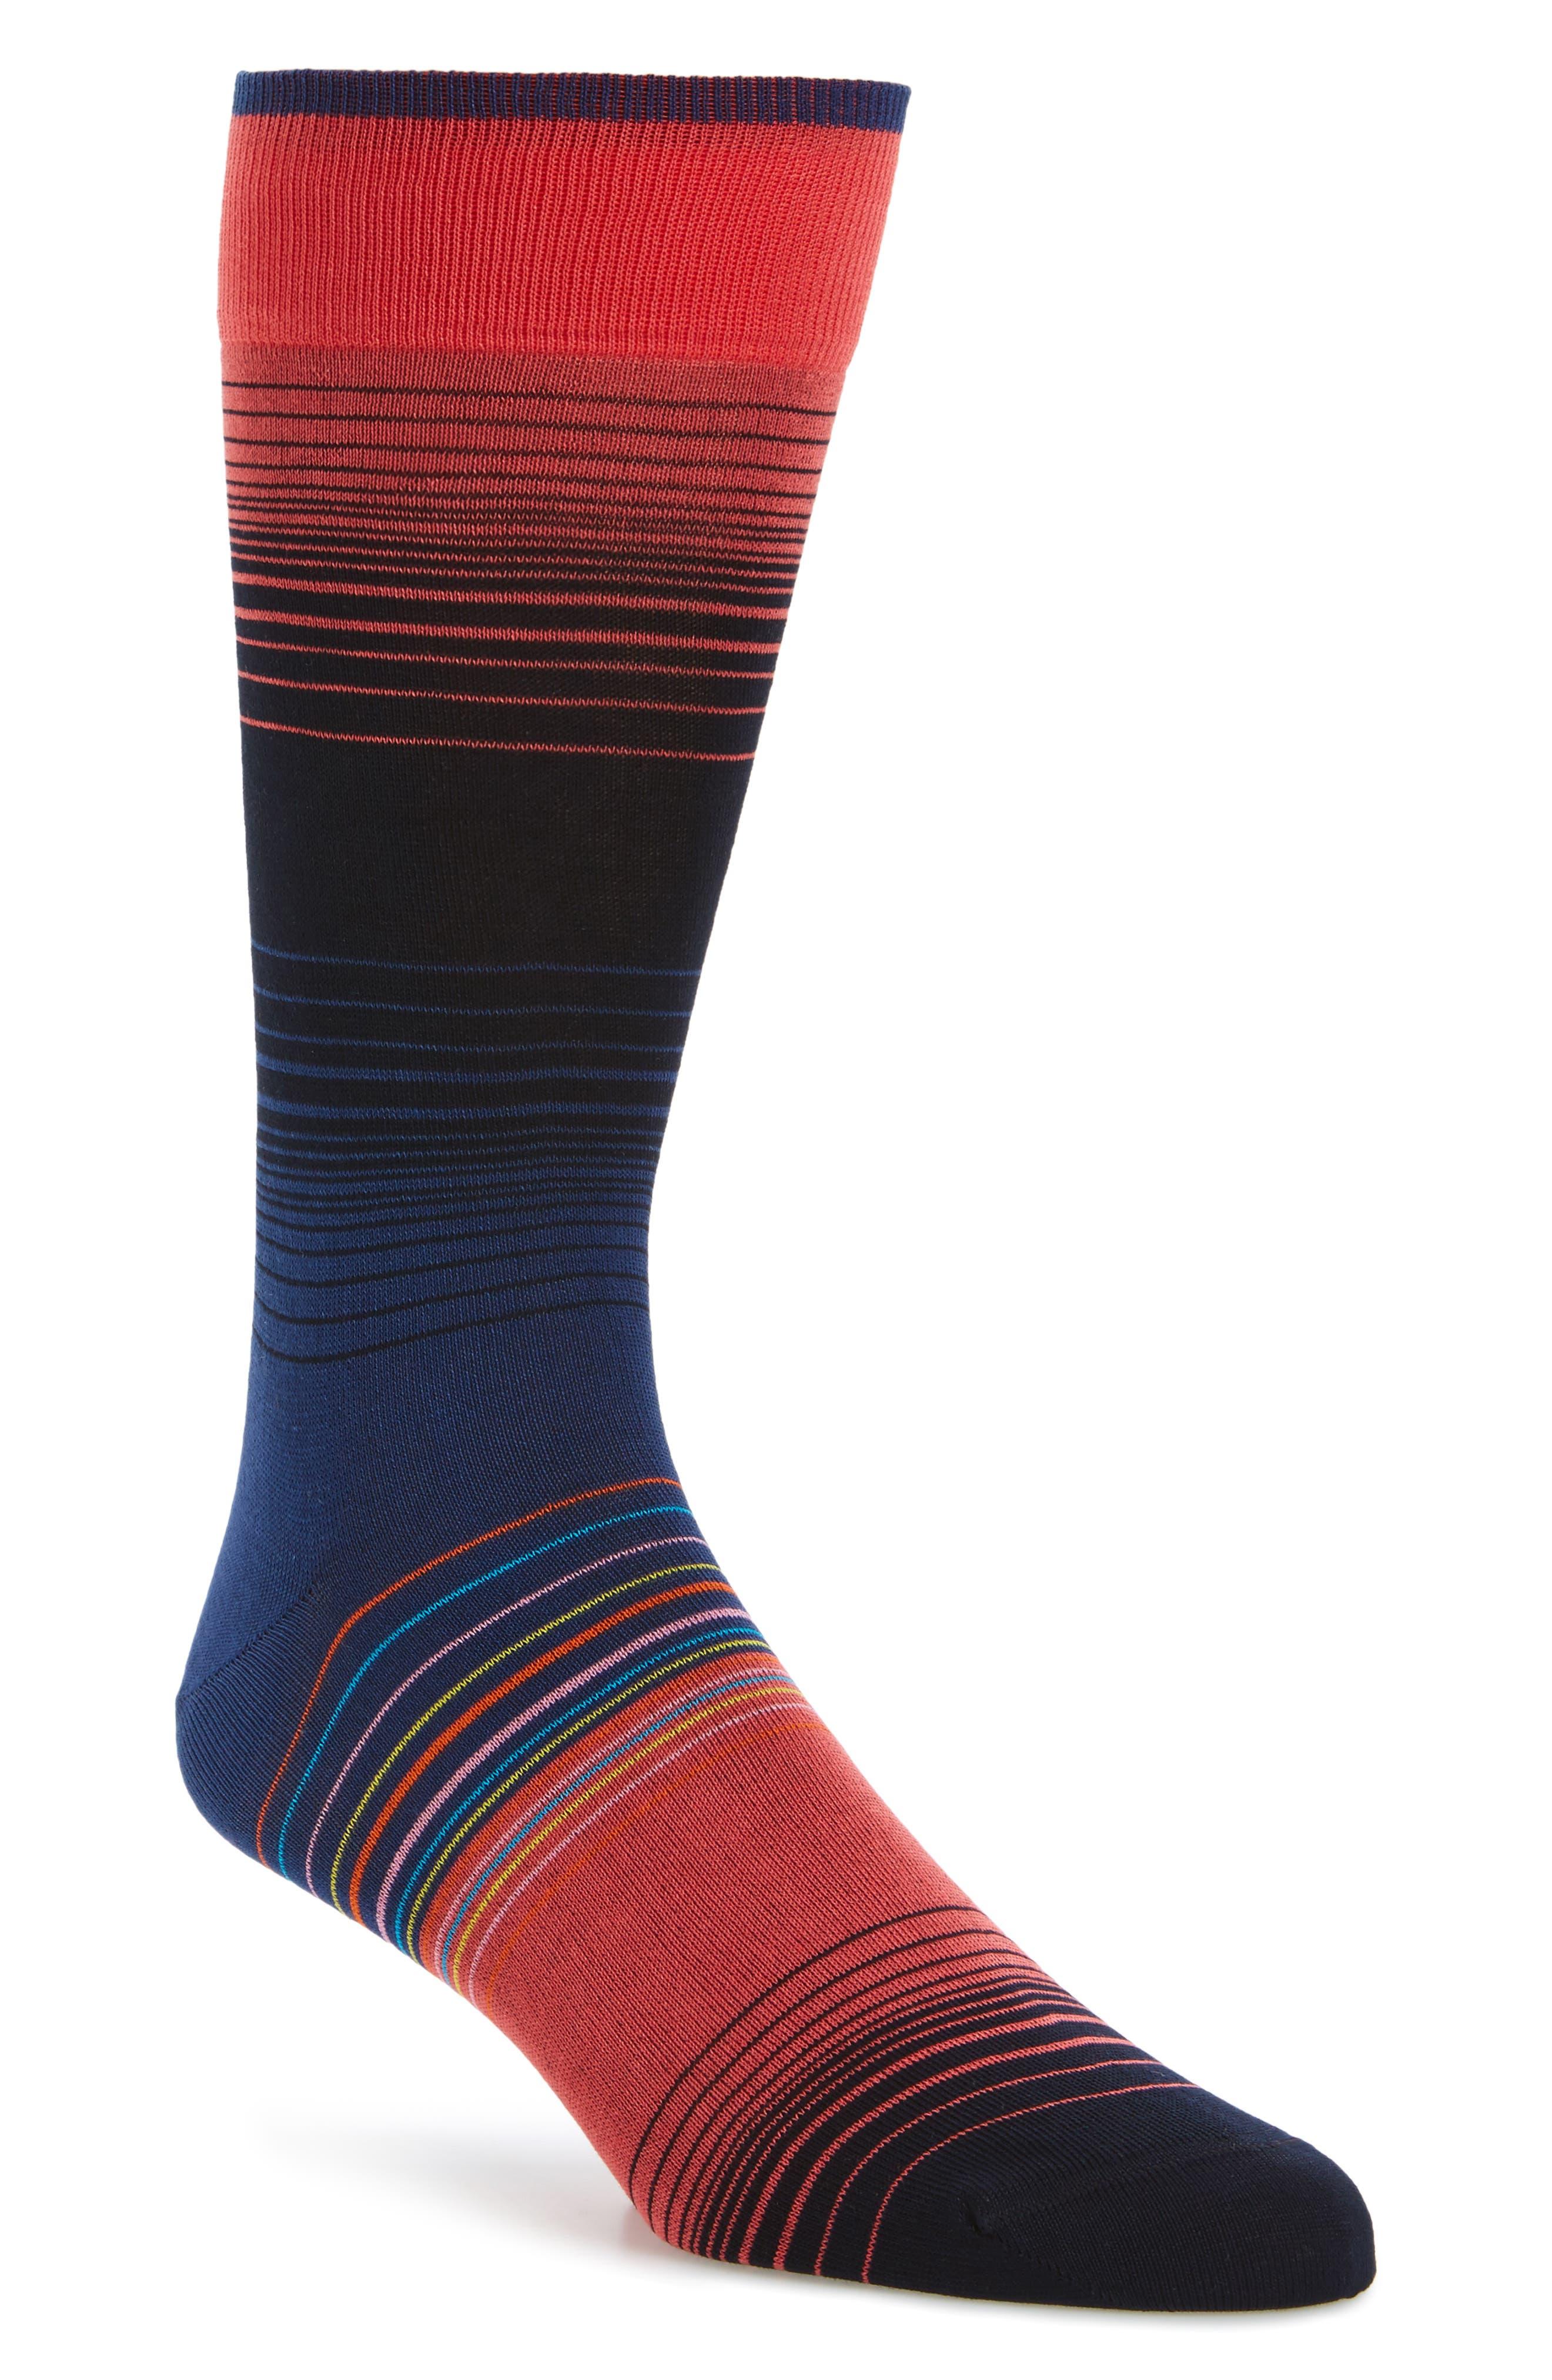 Stripe Socks,                             Main thumbnail 1, color,                             Coral/ Black